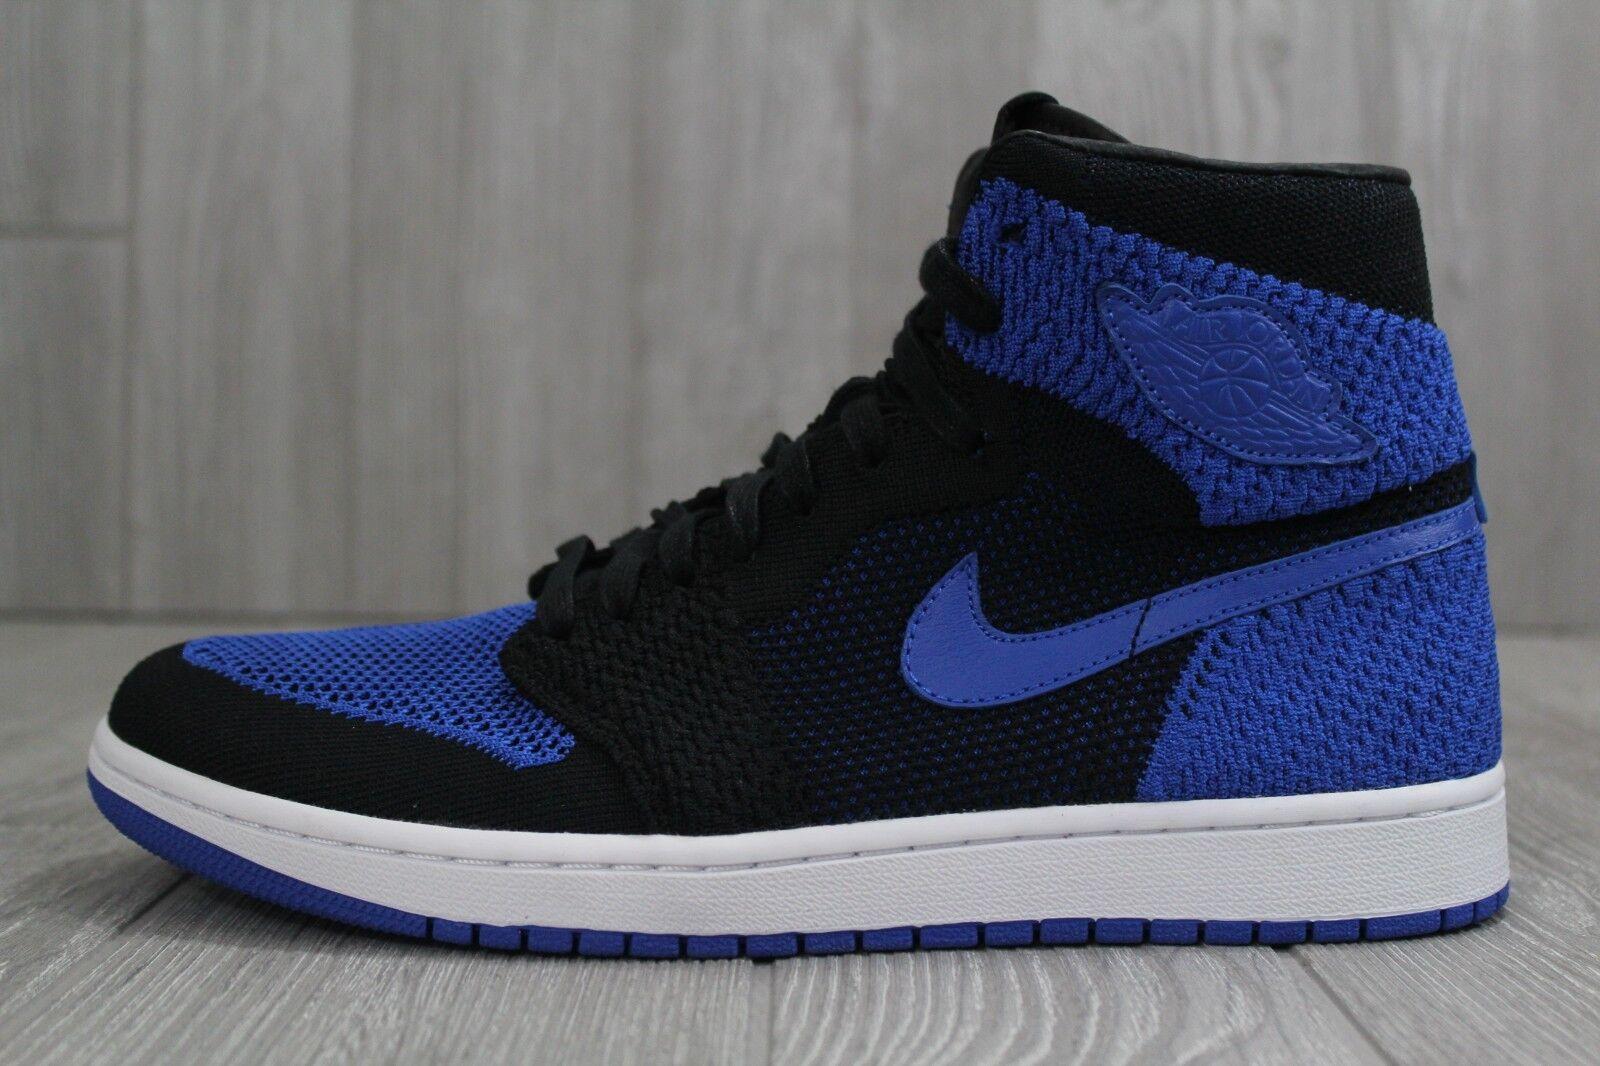 32 Nike Air Jordan 1 High Flyknit Black/Blue Shoes Sizes 10-11.5 919704 006